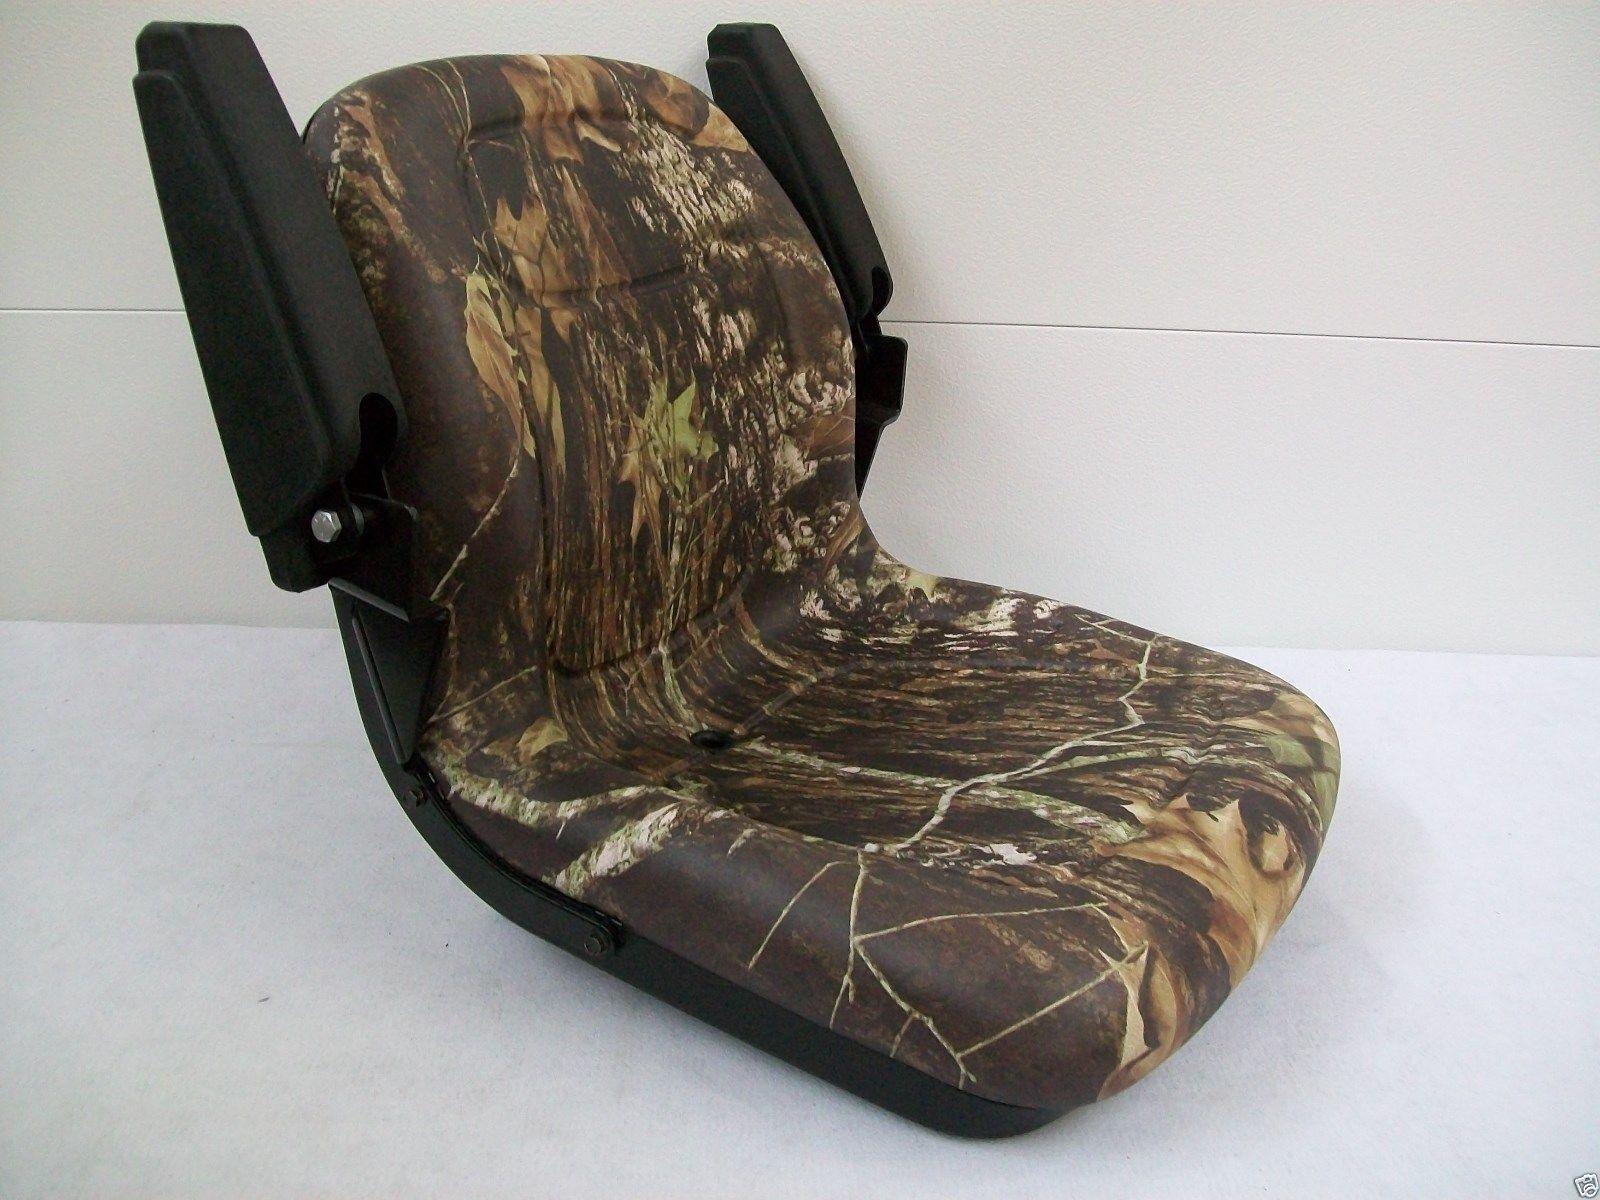 320 John Deere Replacement Seat : Camo seat john deere f